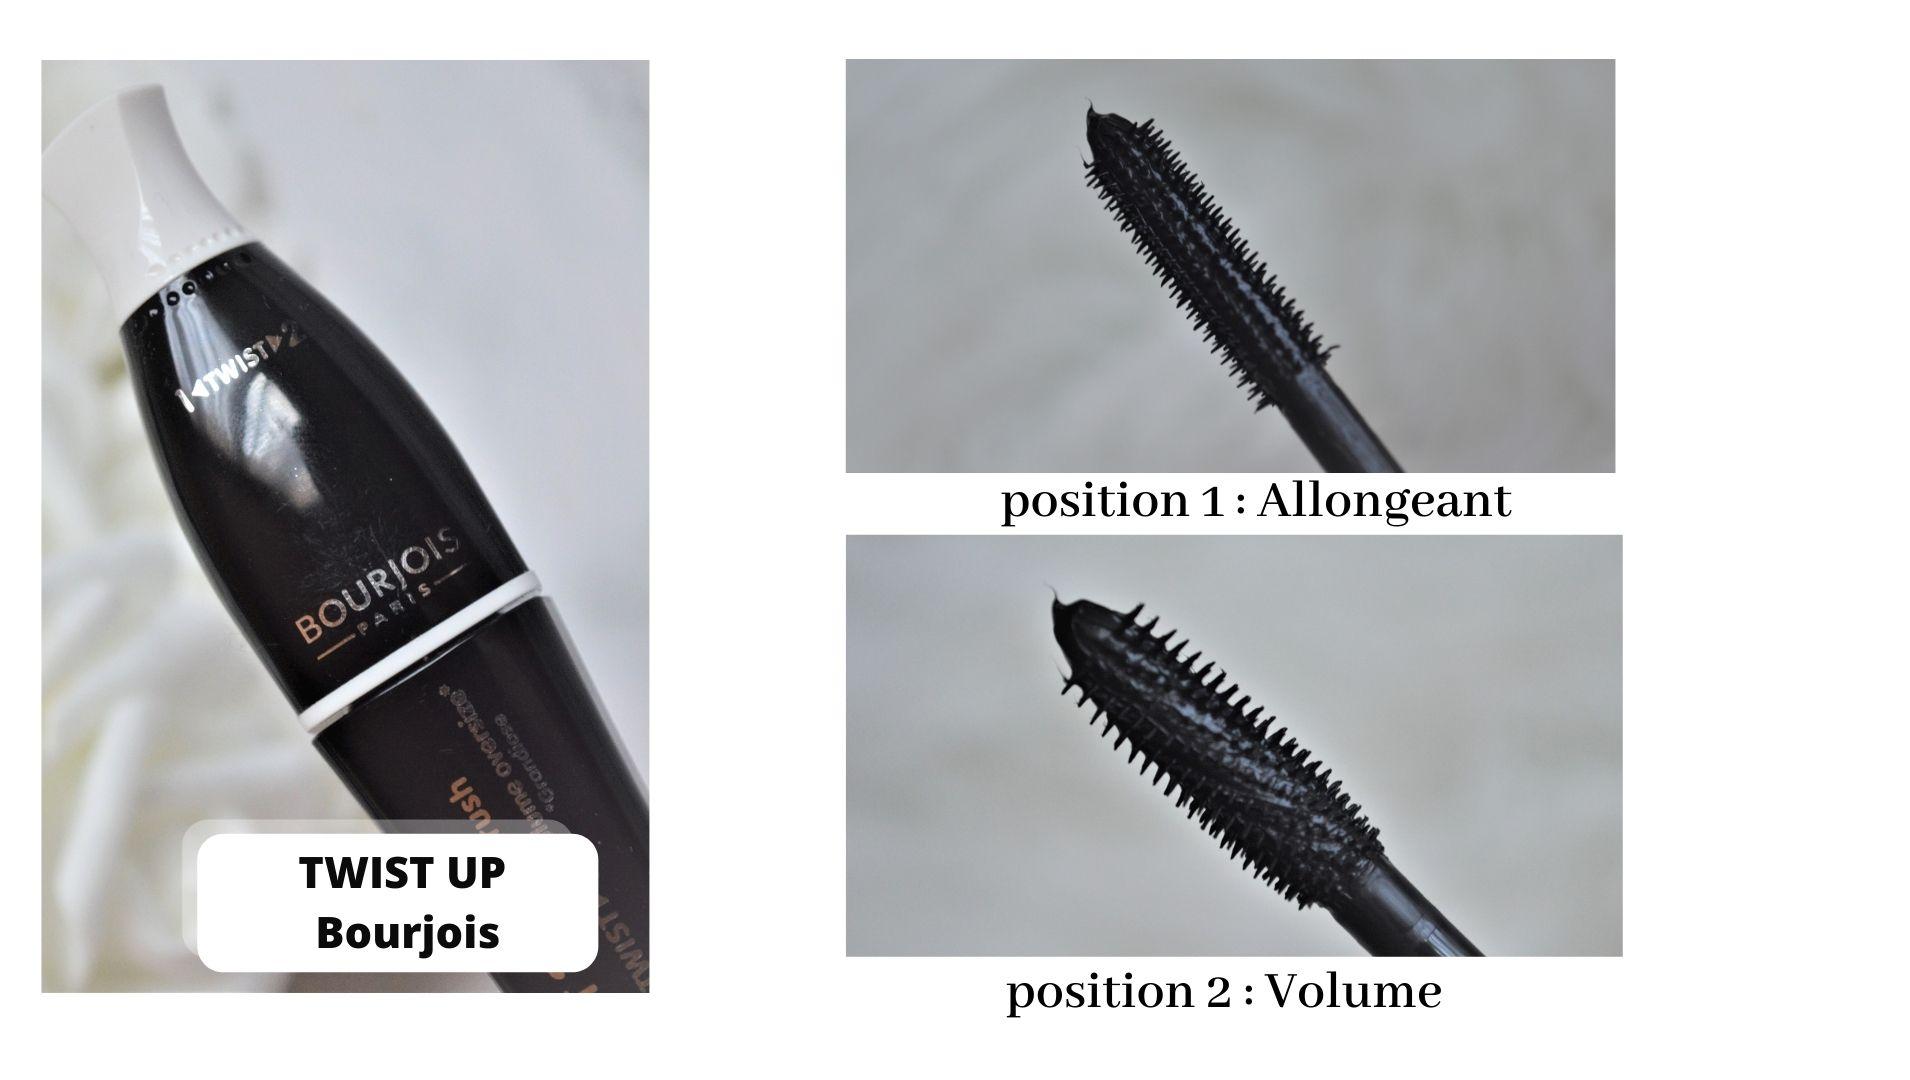 Embout mascara Twist up the volume bourjois